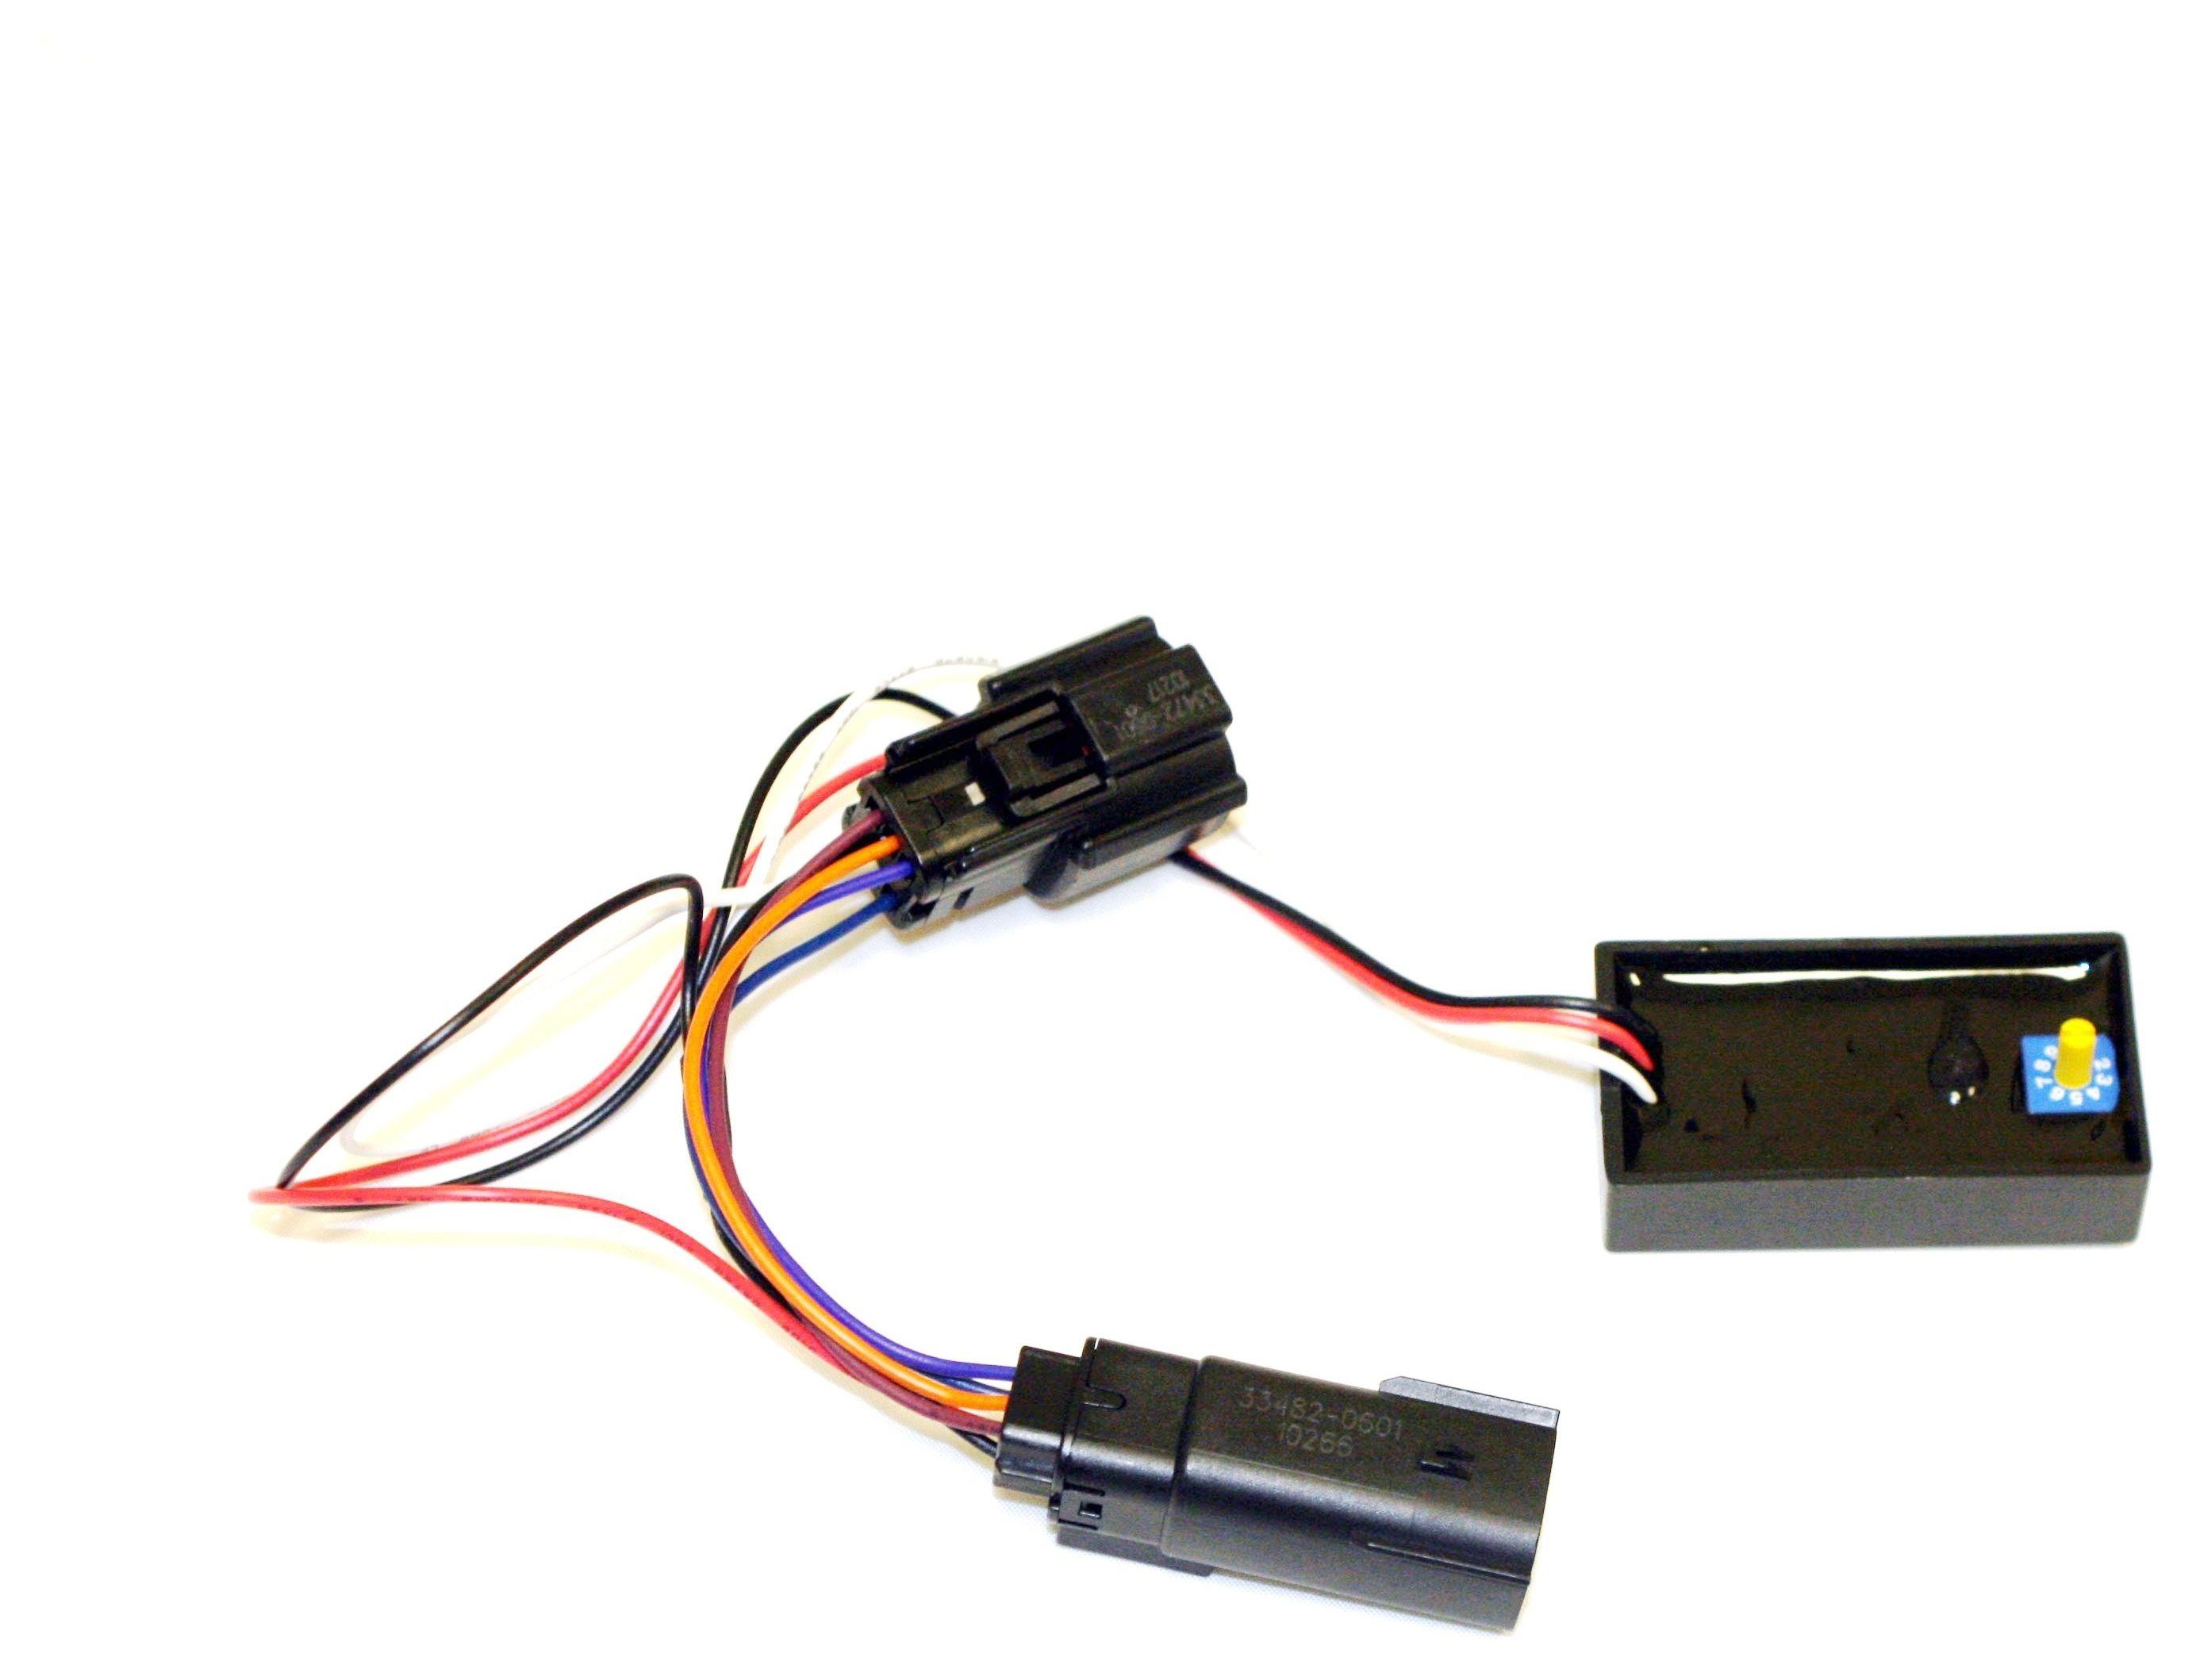 Strange 2015 Flhtcu 4 Pin Wiring Harness Wiring Diagram Wiring 101 Photwellnesstrialsorg